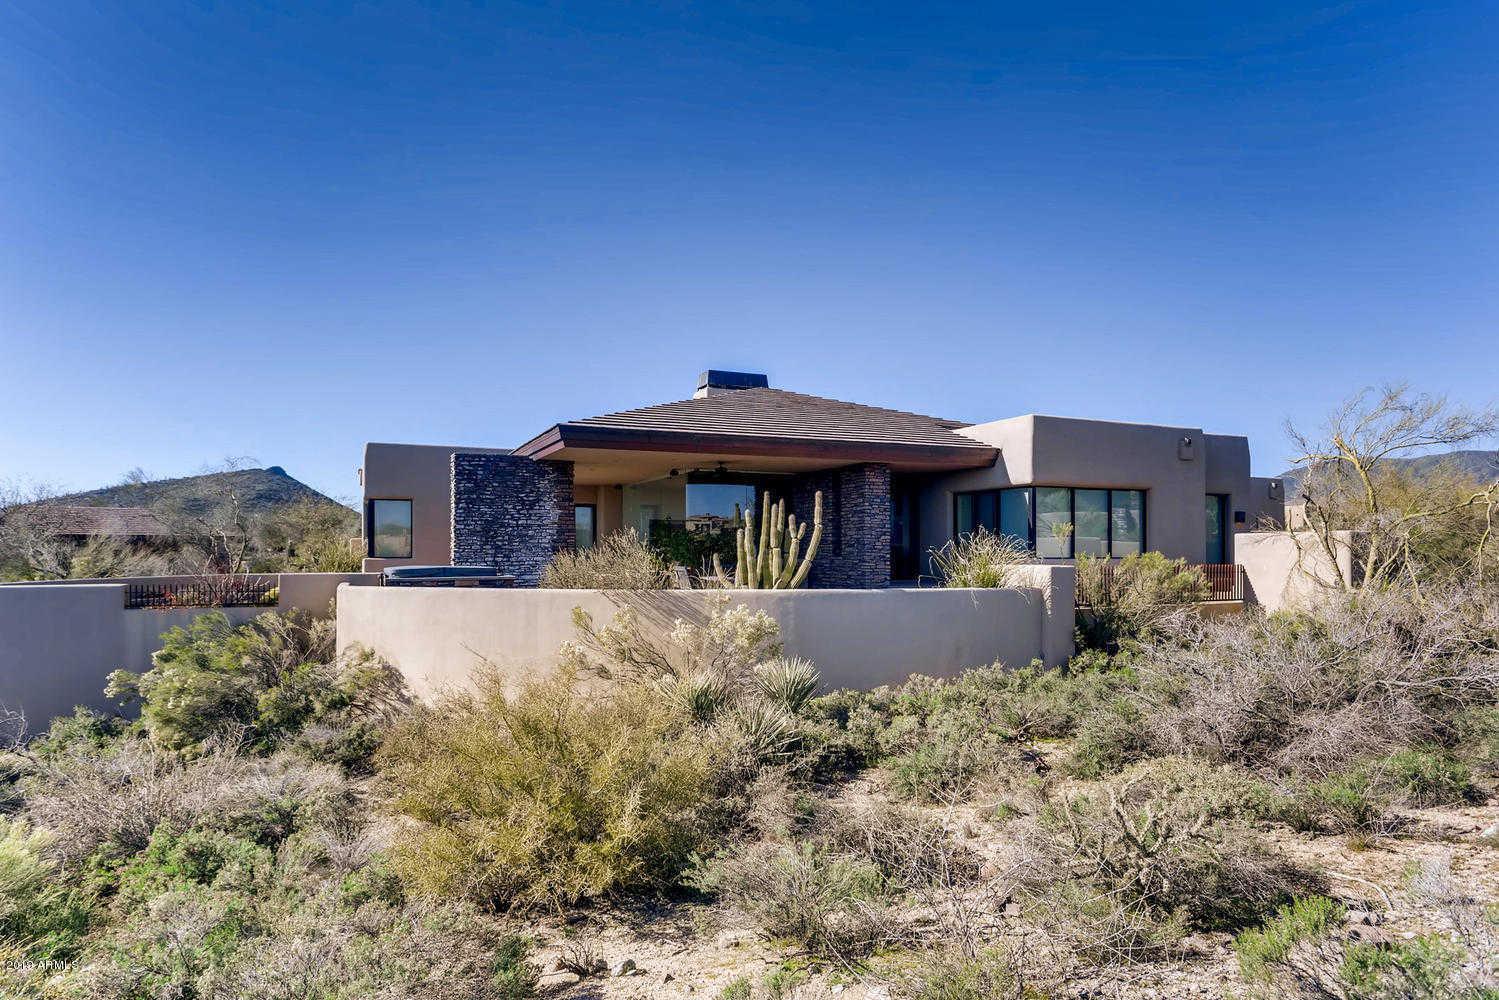 $820,000   3Br/3Ba   Home For Sale In Desert Mountain, Scottsdale